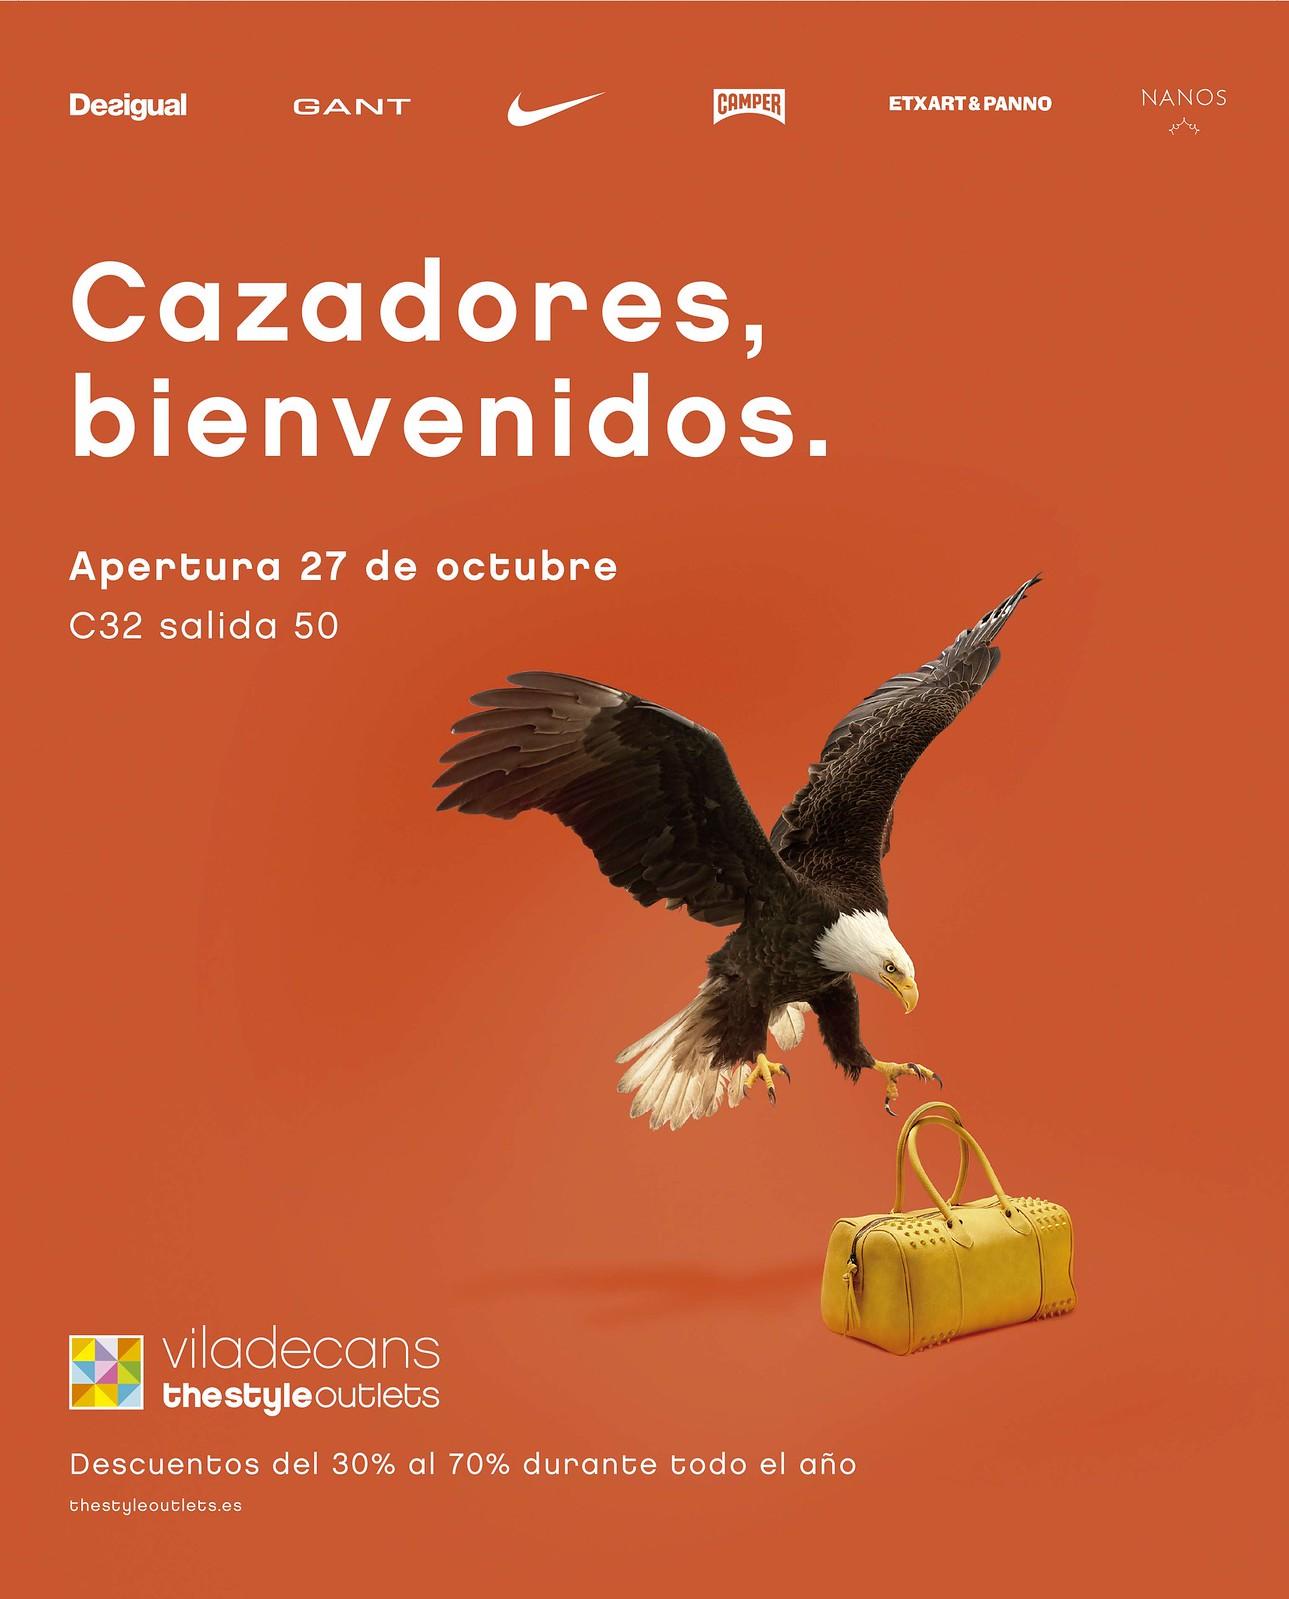 VILADECANS THE STYLE OUTLETS - Cazadores Bienvenidos